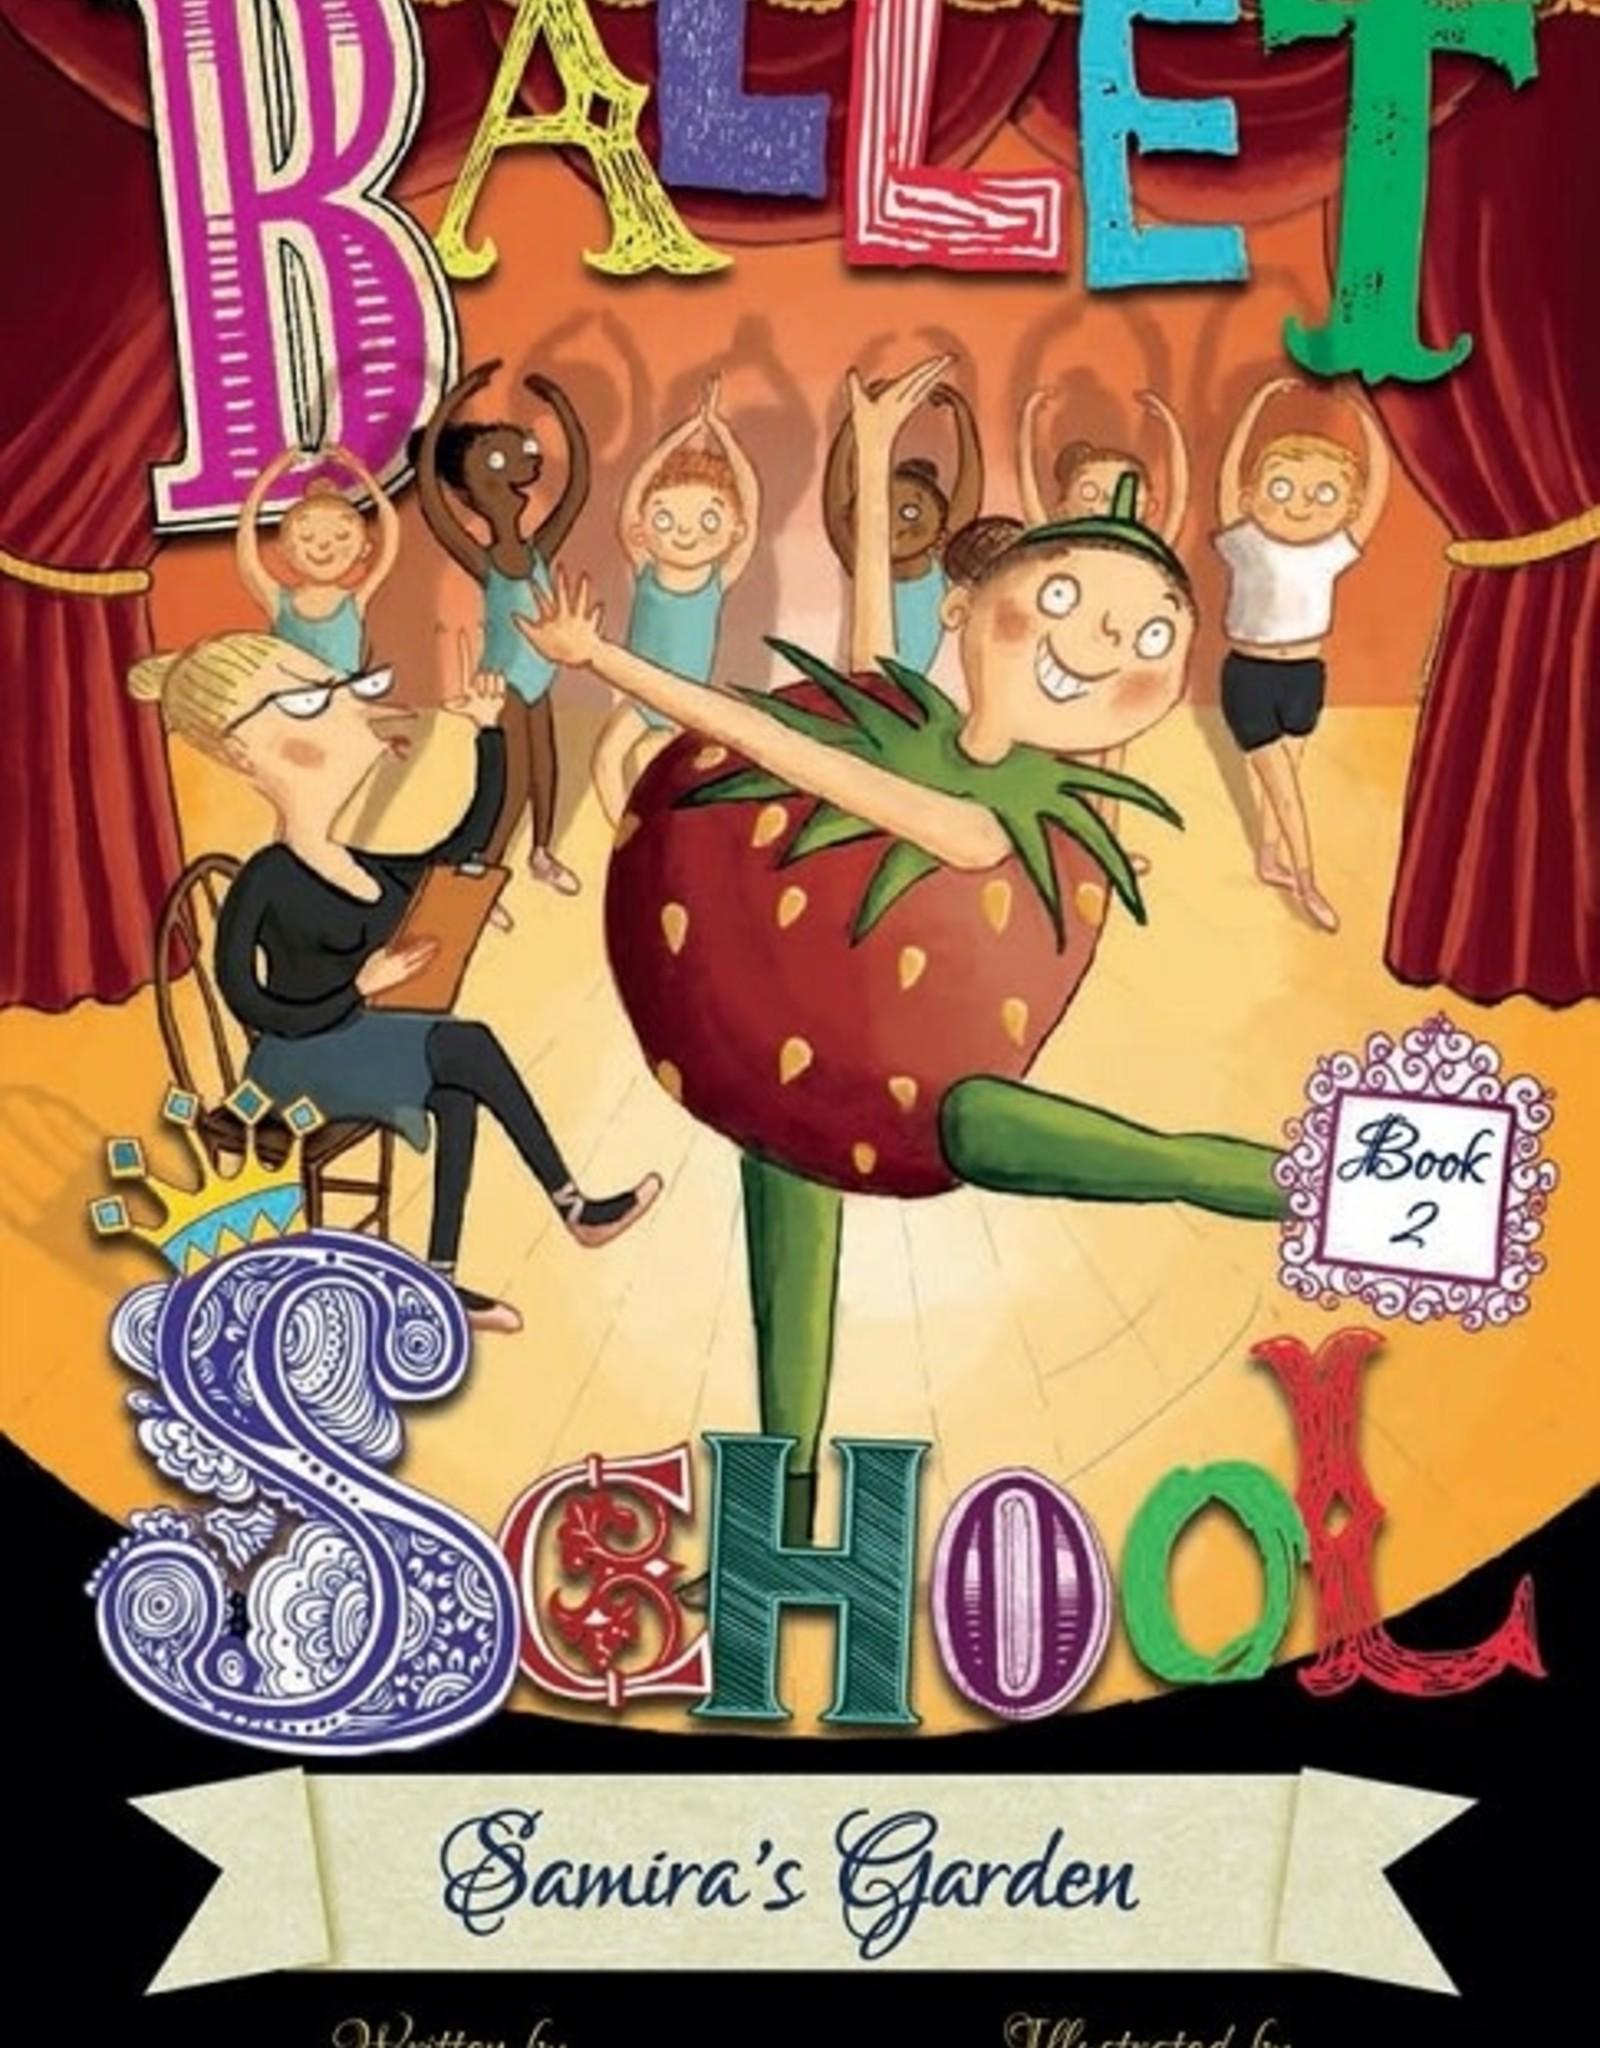 Samira's Garden: Ballet School - Book 2